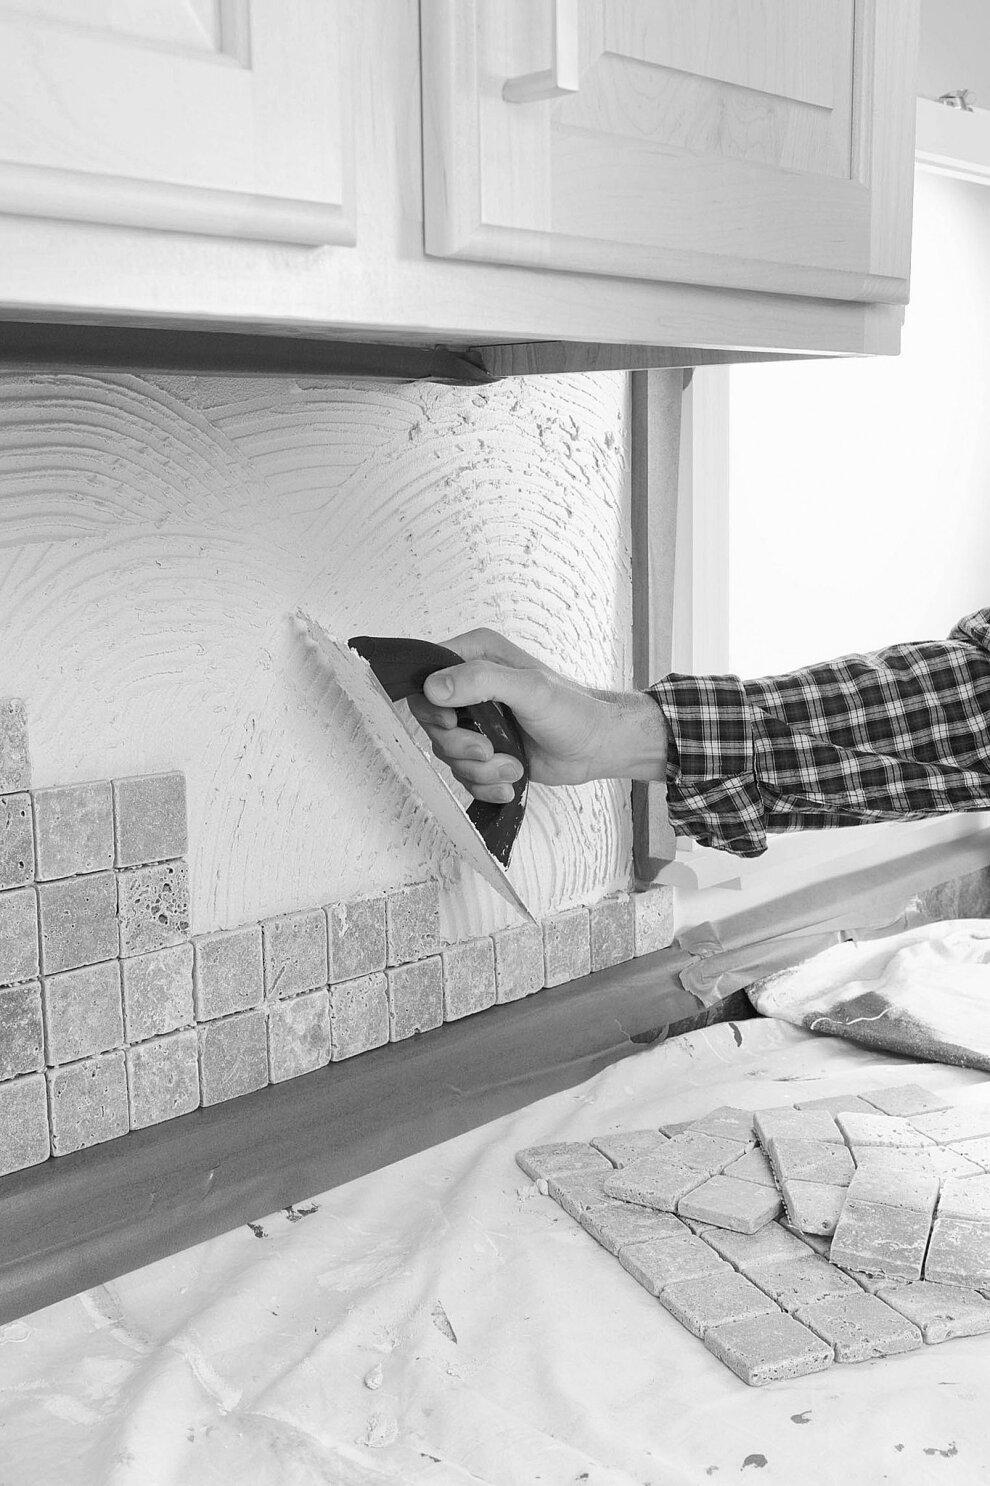 - Installing Kitchen Backsplash Is A Weekend Project - The San Diego